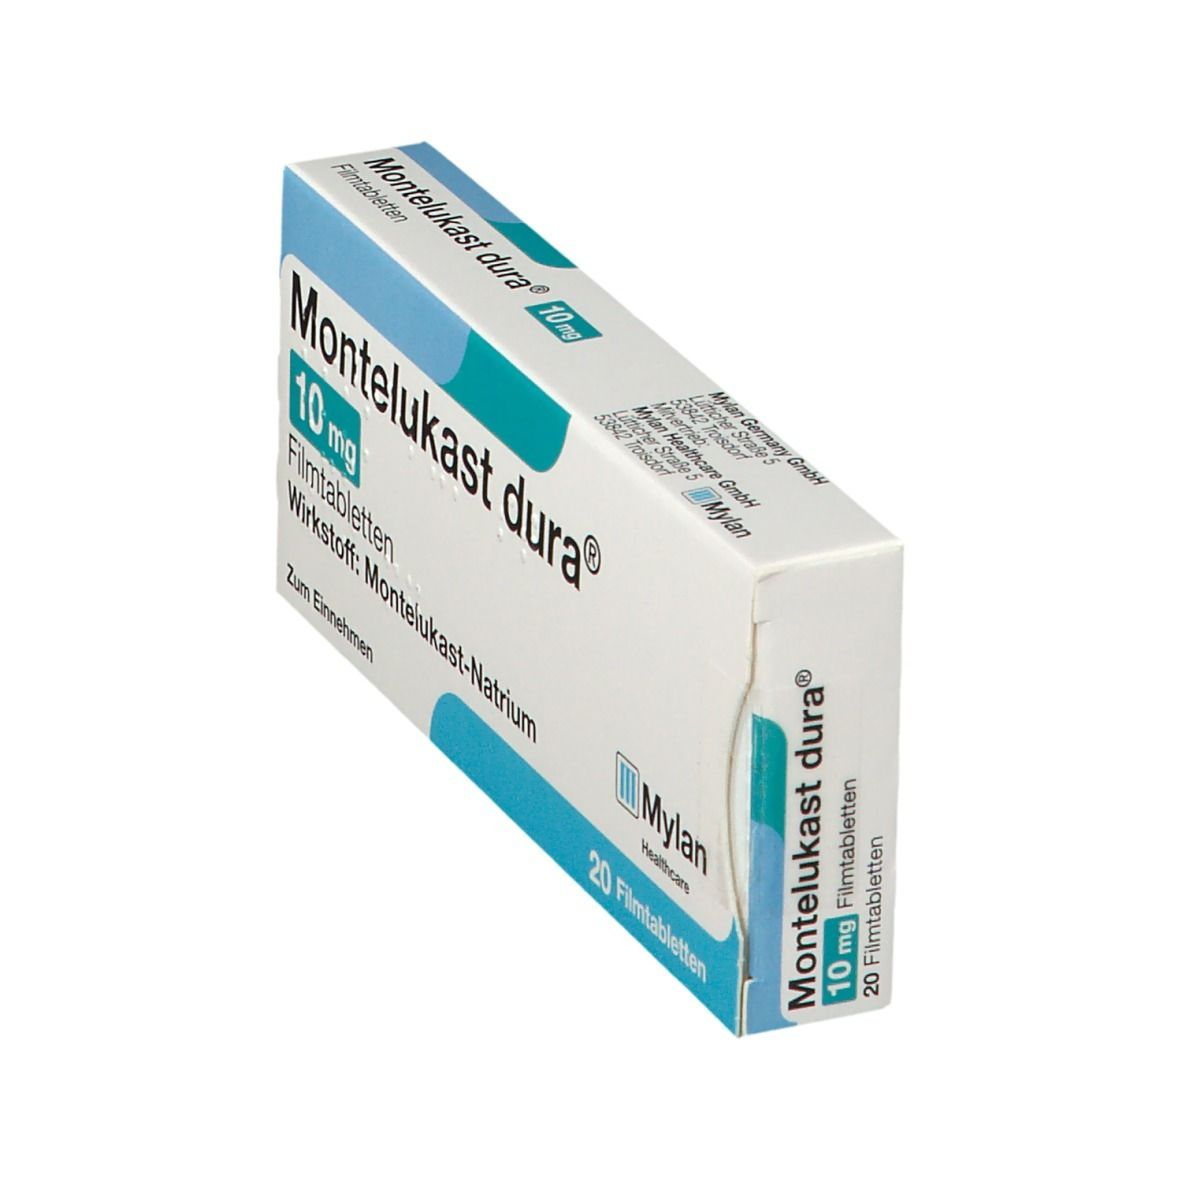 MONTELUKAST dura 10 mg Filmtabletten 20 St - shop-apotheke.com